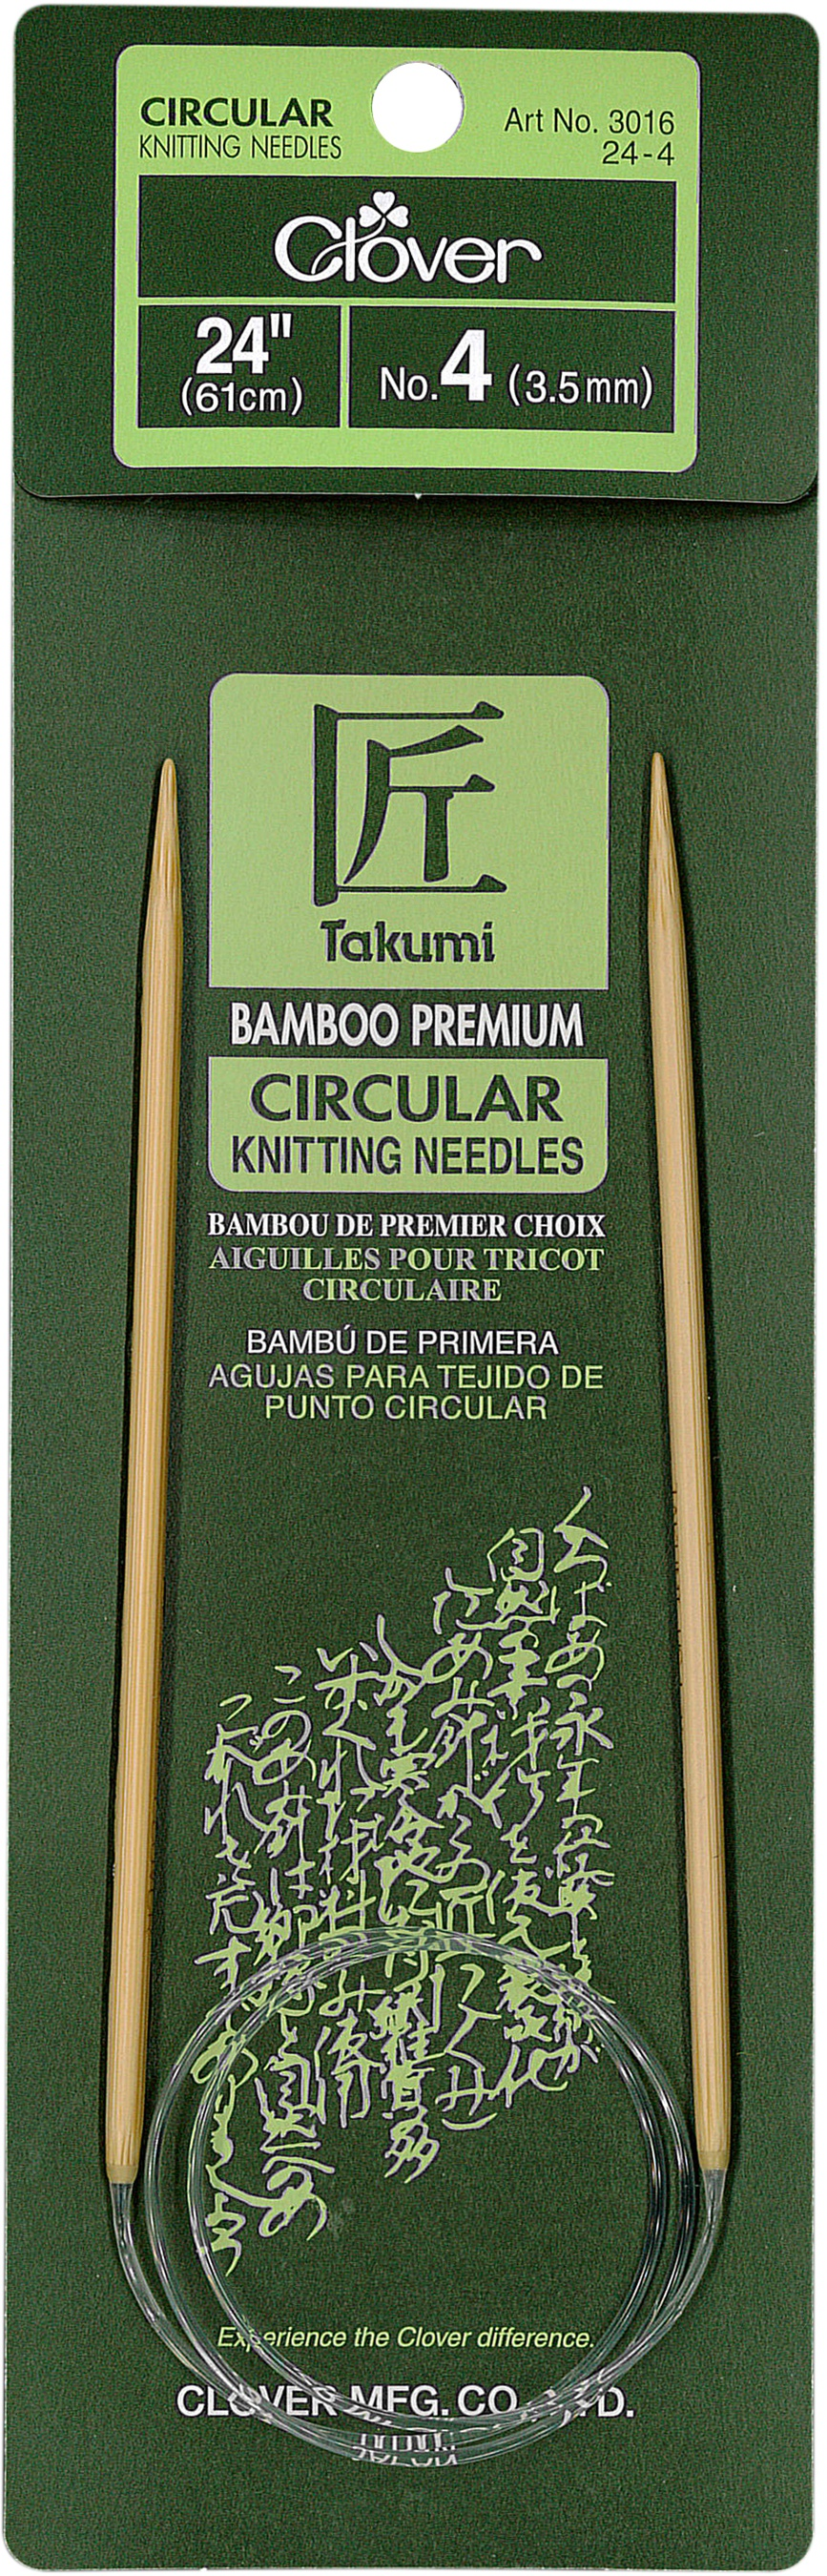 Takumi-Bamboo-Circular-Knitting-Needles-24-034-Size-4-3-5mm